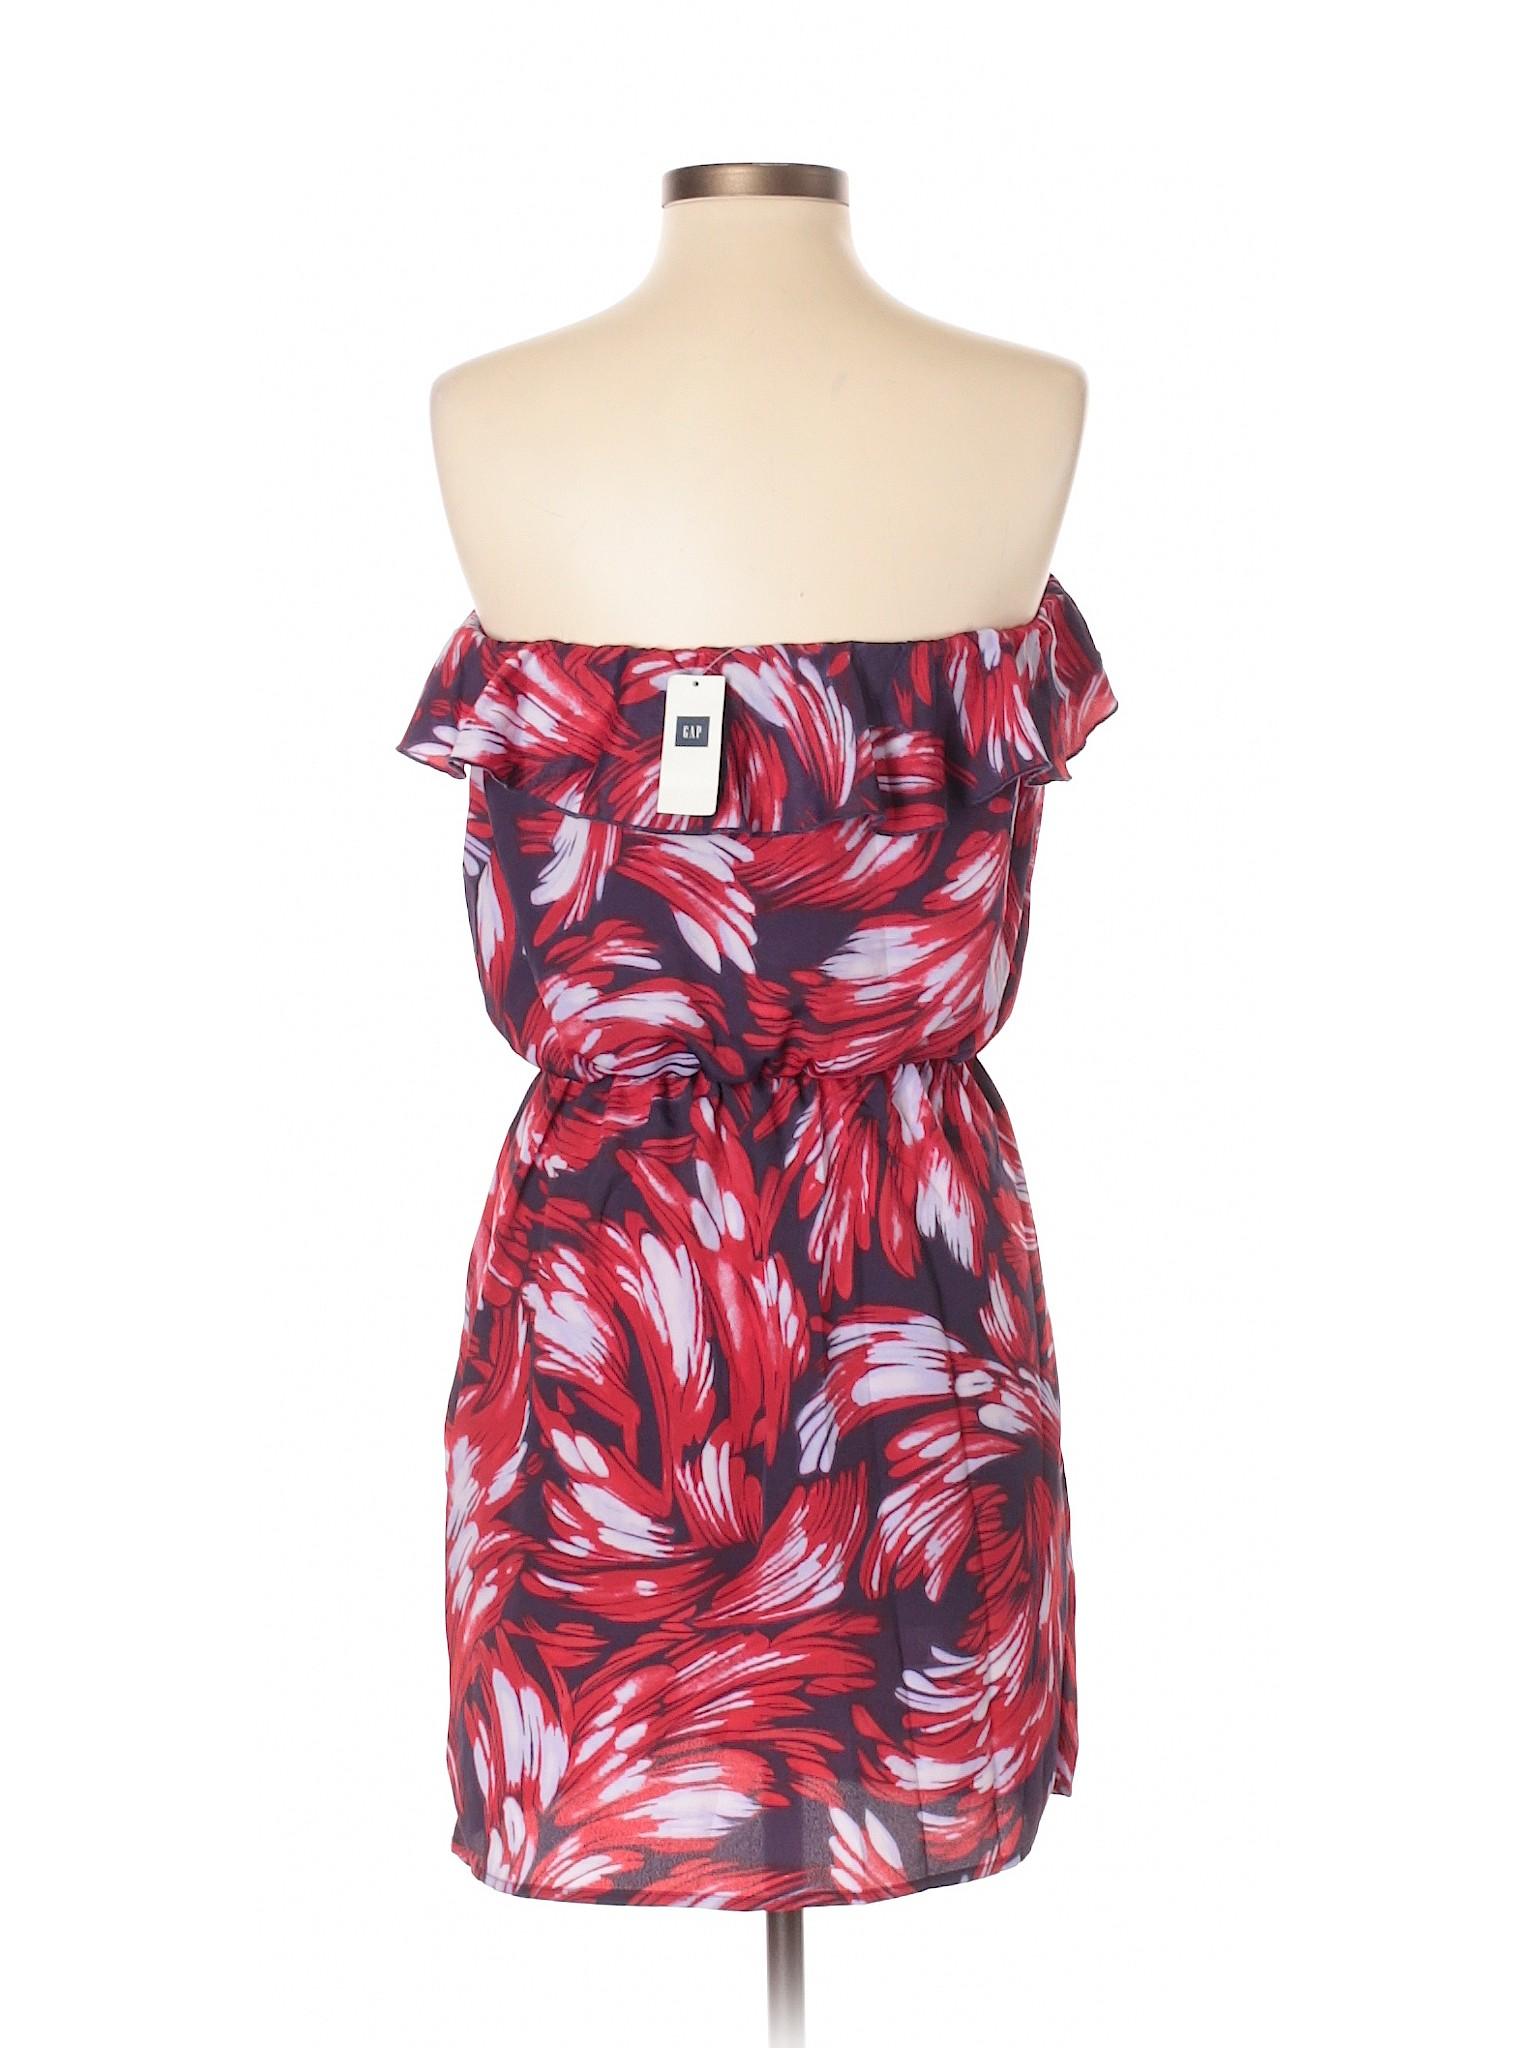 winter Casual Boutique Dress Outlet Gap 1wTqB8